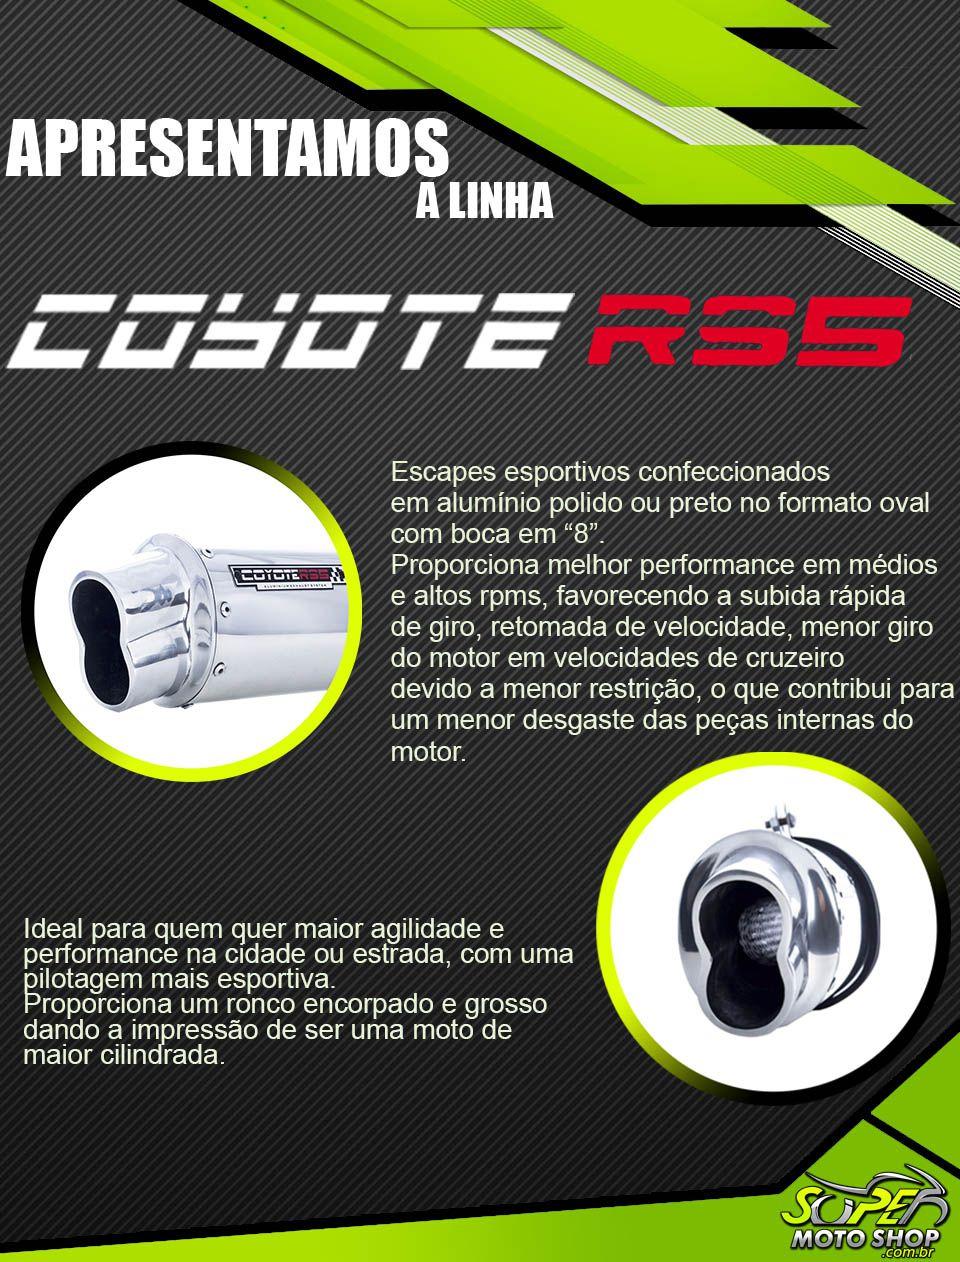 Escape / Ponteira Coyote RS5 Boca 8 Aluminio Oval - YBR Factor 150 - Yamaha